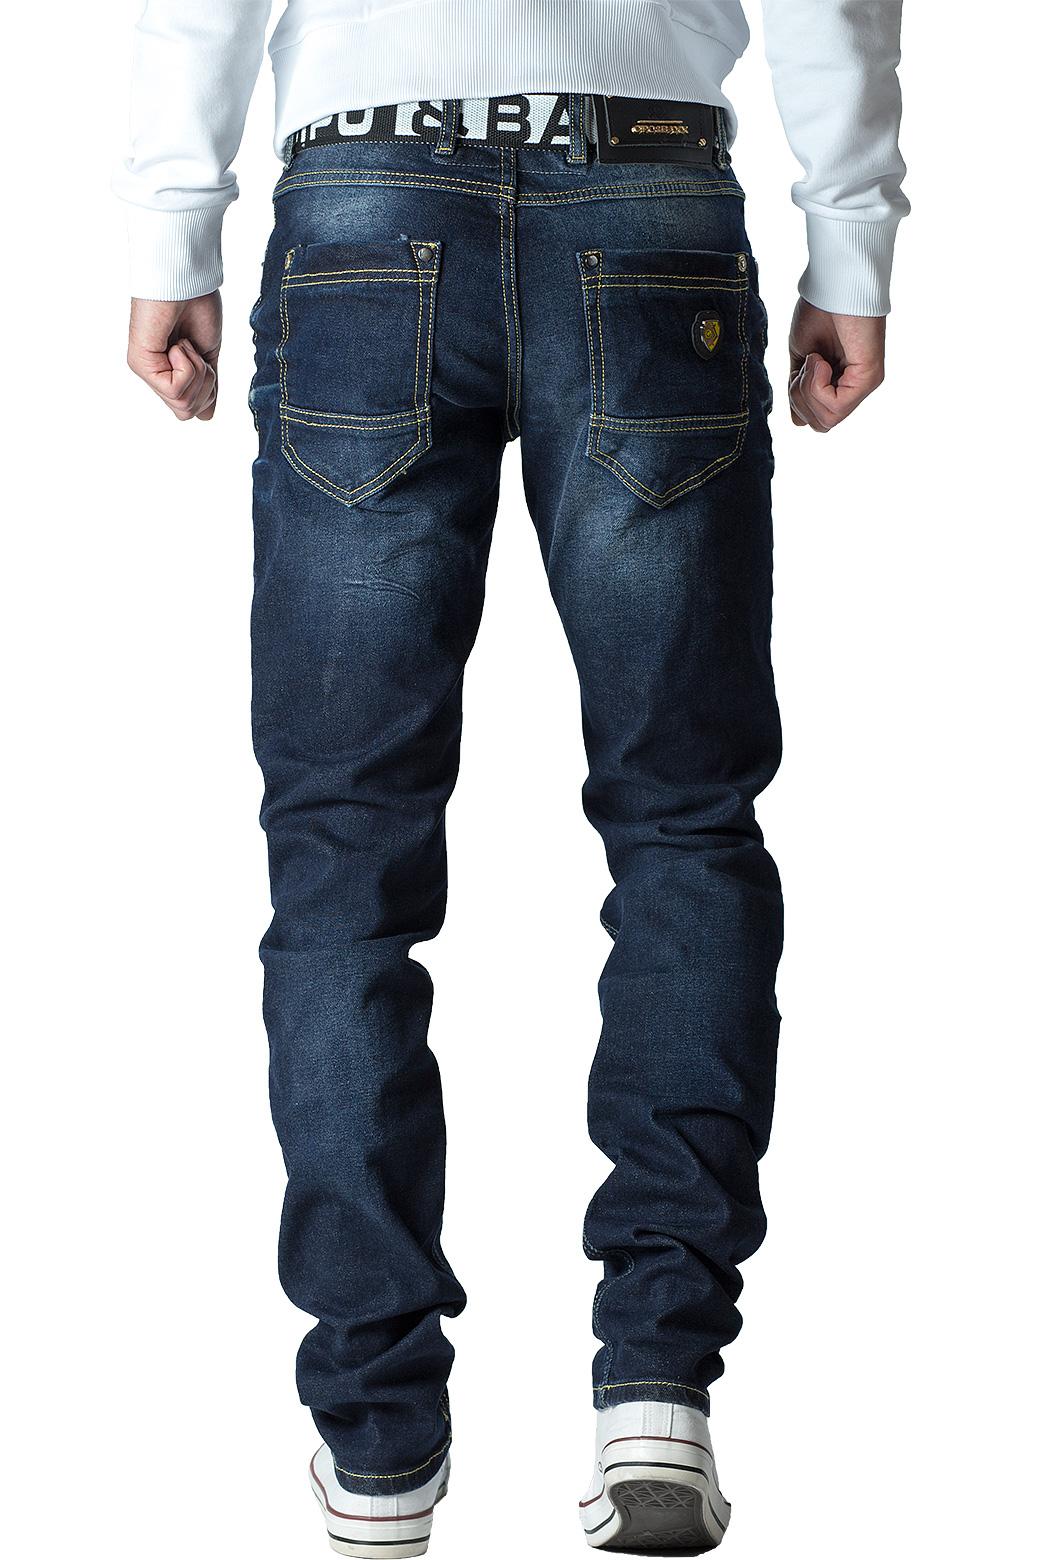 Cipo-amp-Baxx-Uomo-Jeans-Pantaloni-ricamate-Biker-Style-streetwear-nervature-pattern-Dope miniatura 30